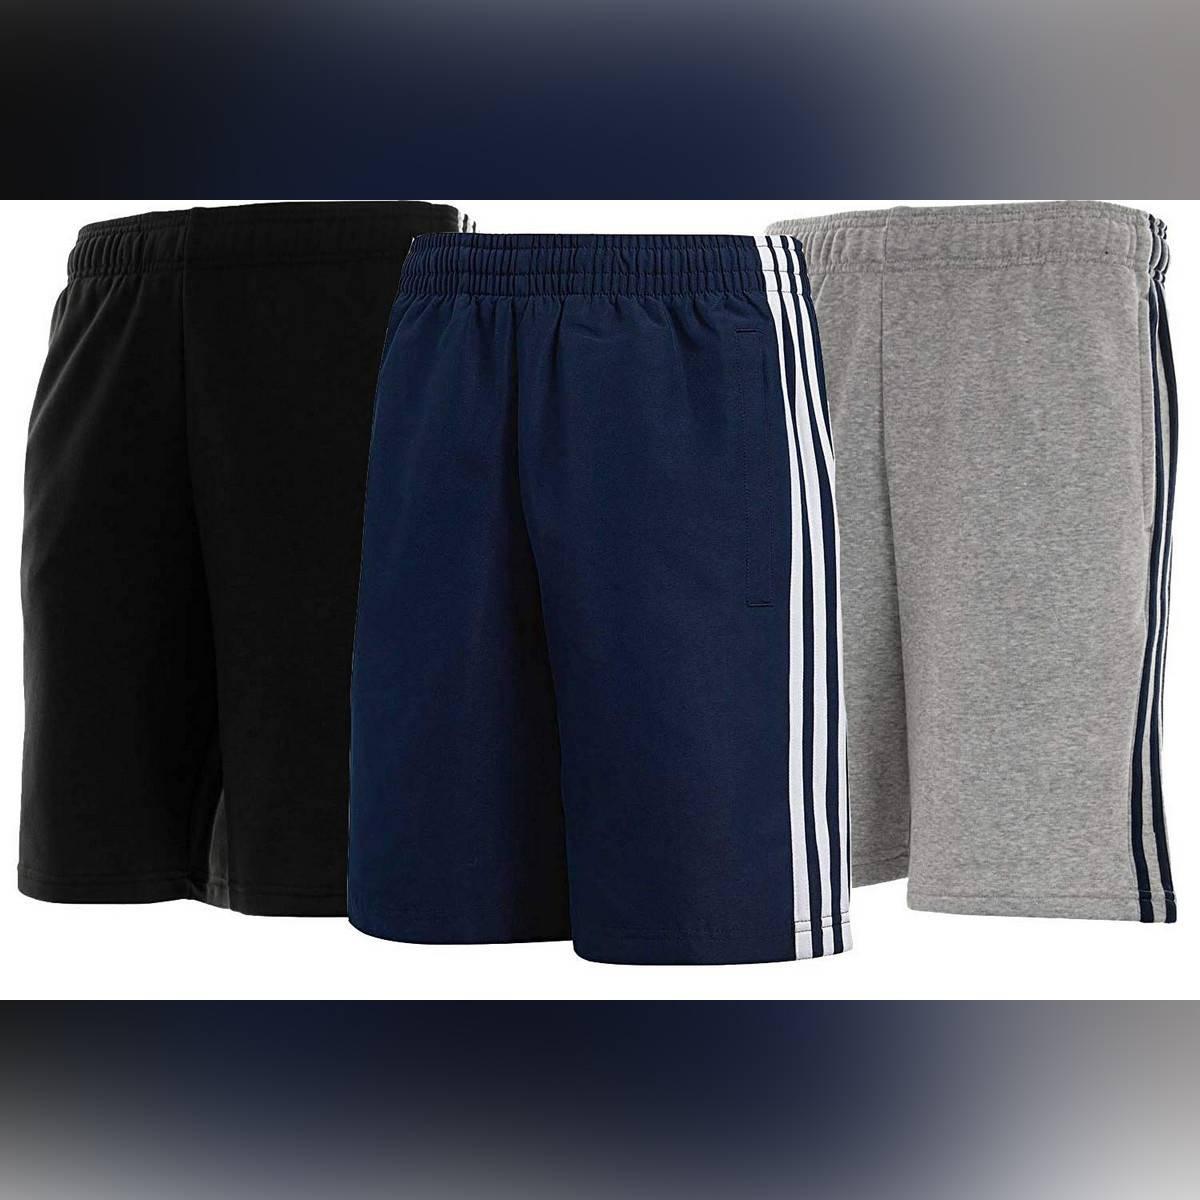 Summer Sports Gym Shorts for Men